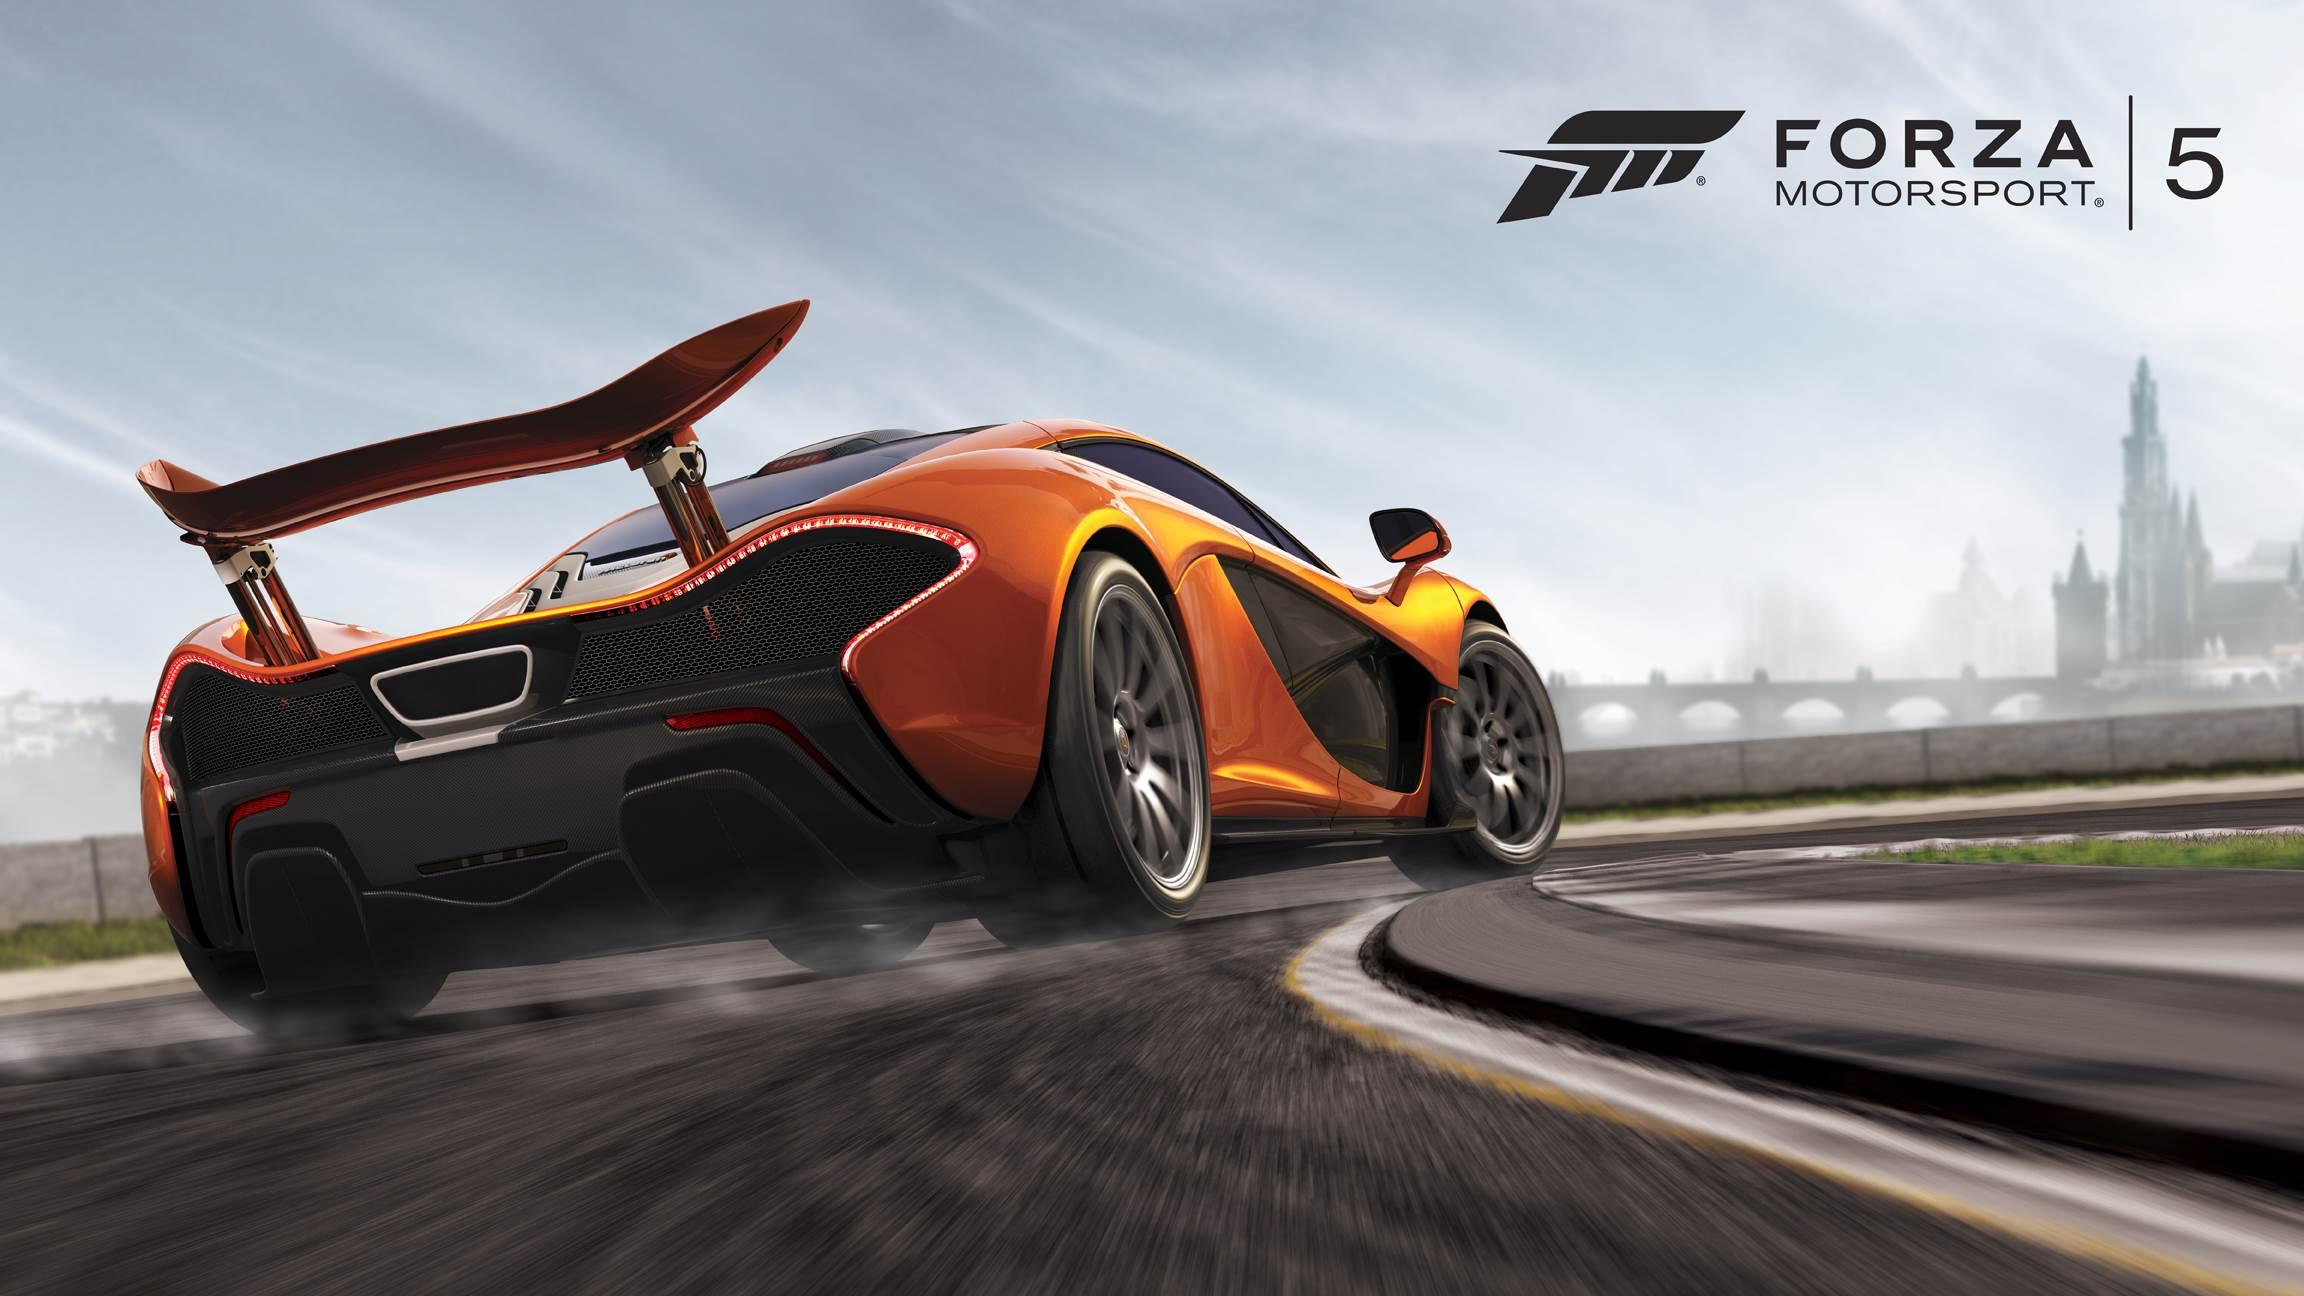 http://www.gamefm.com.br/wp-content/uploads/2013/11/Forza5.jpg